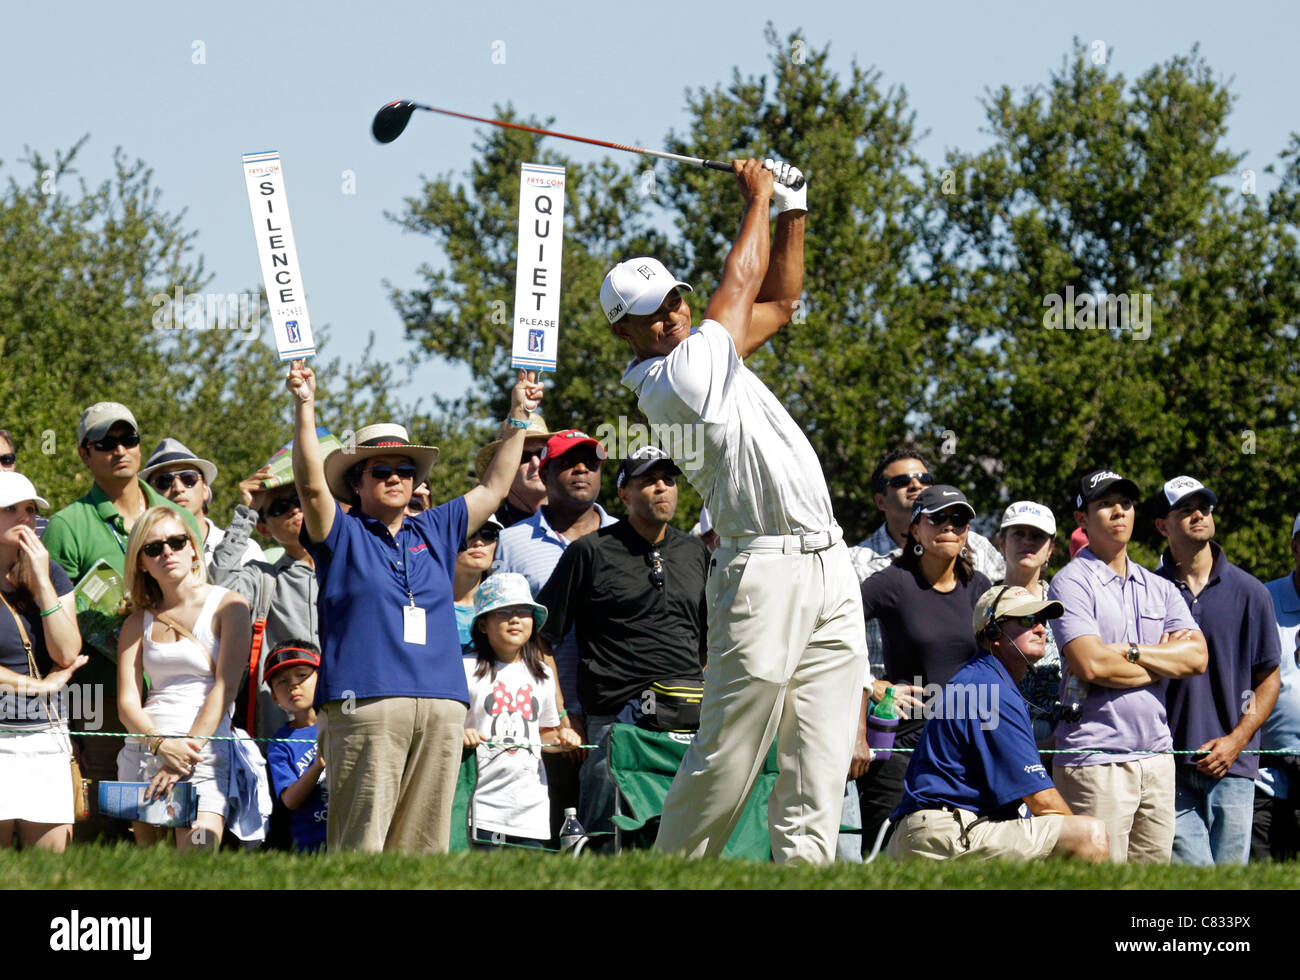 Tiger Woods in California PGA golf golfer - Stock Image